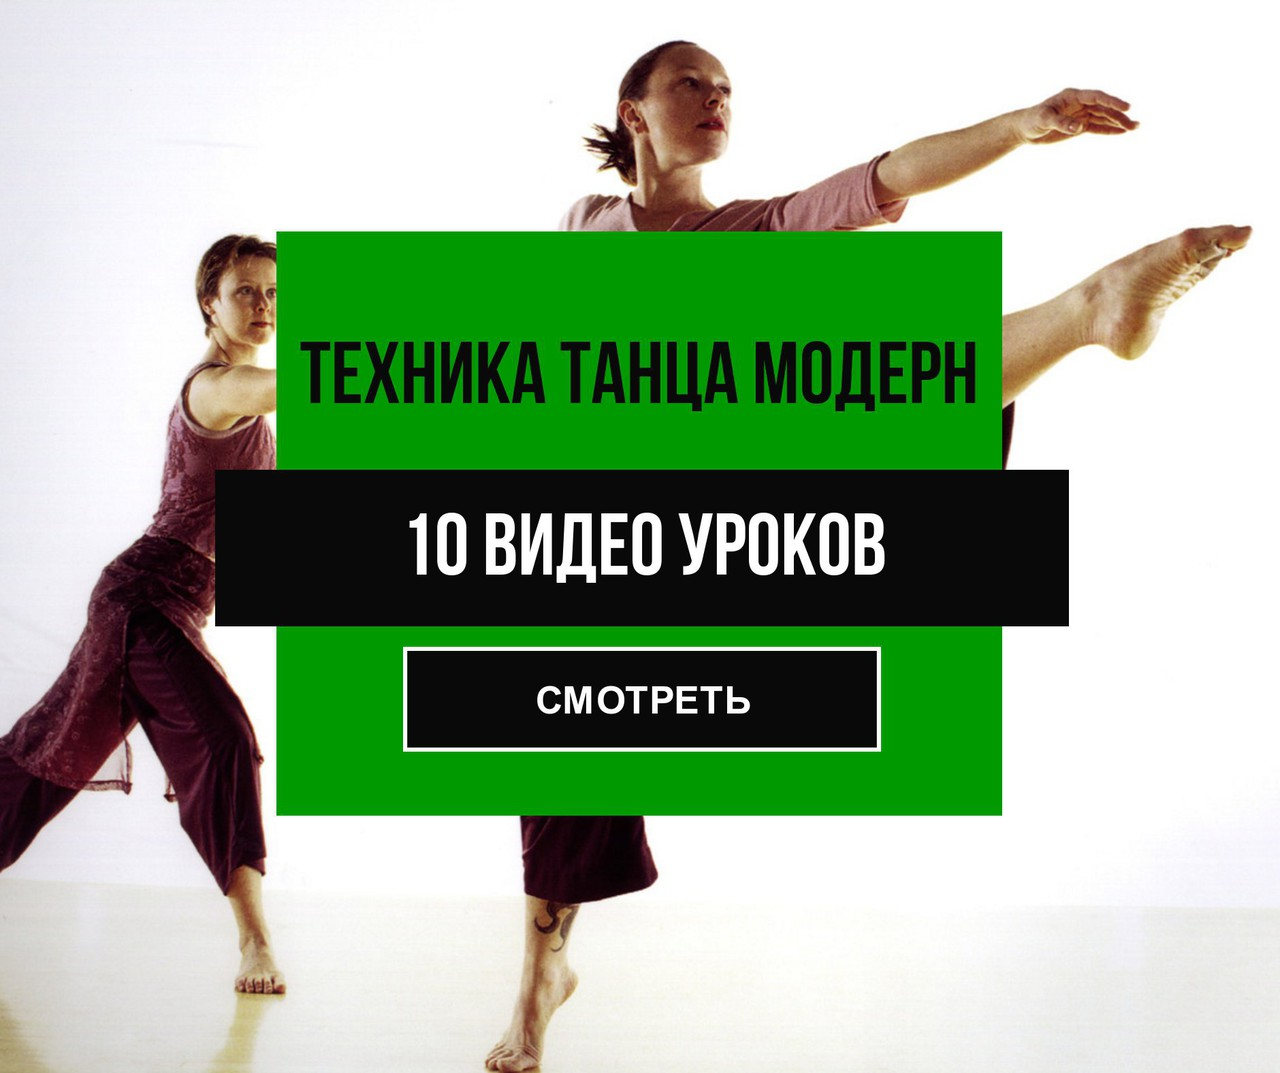 Техника танца модерн